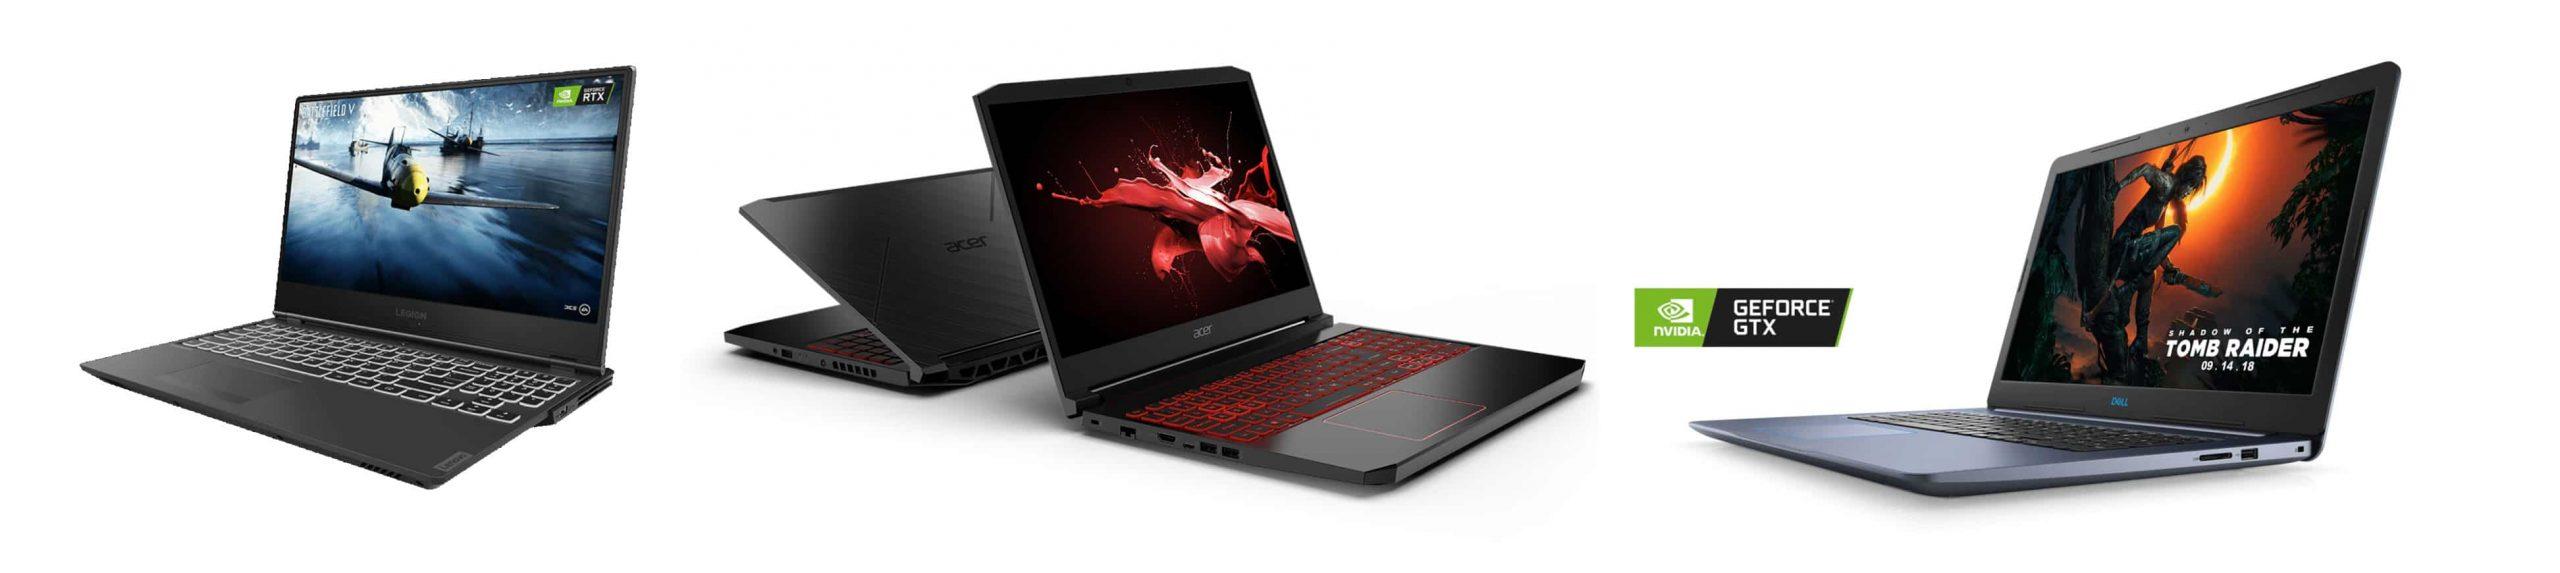 Gaming laptops under $1000: Lenovo Legion Y540, Acer Nitro 5 or Dell G3 Gaming